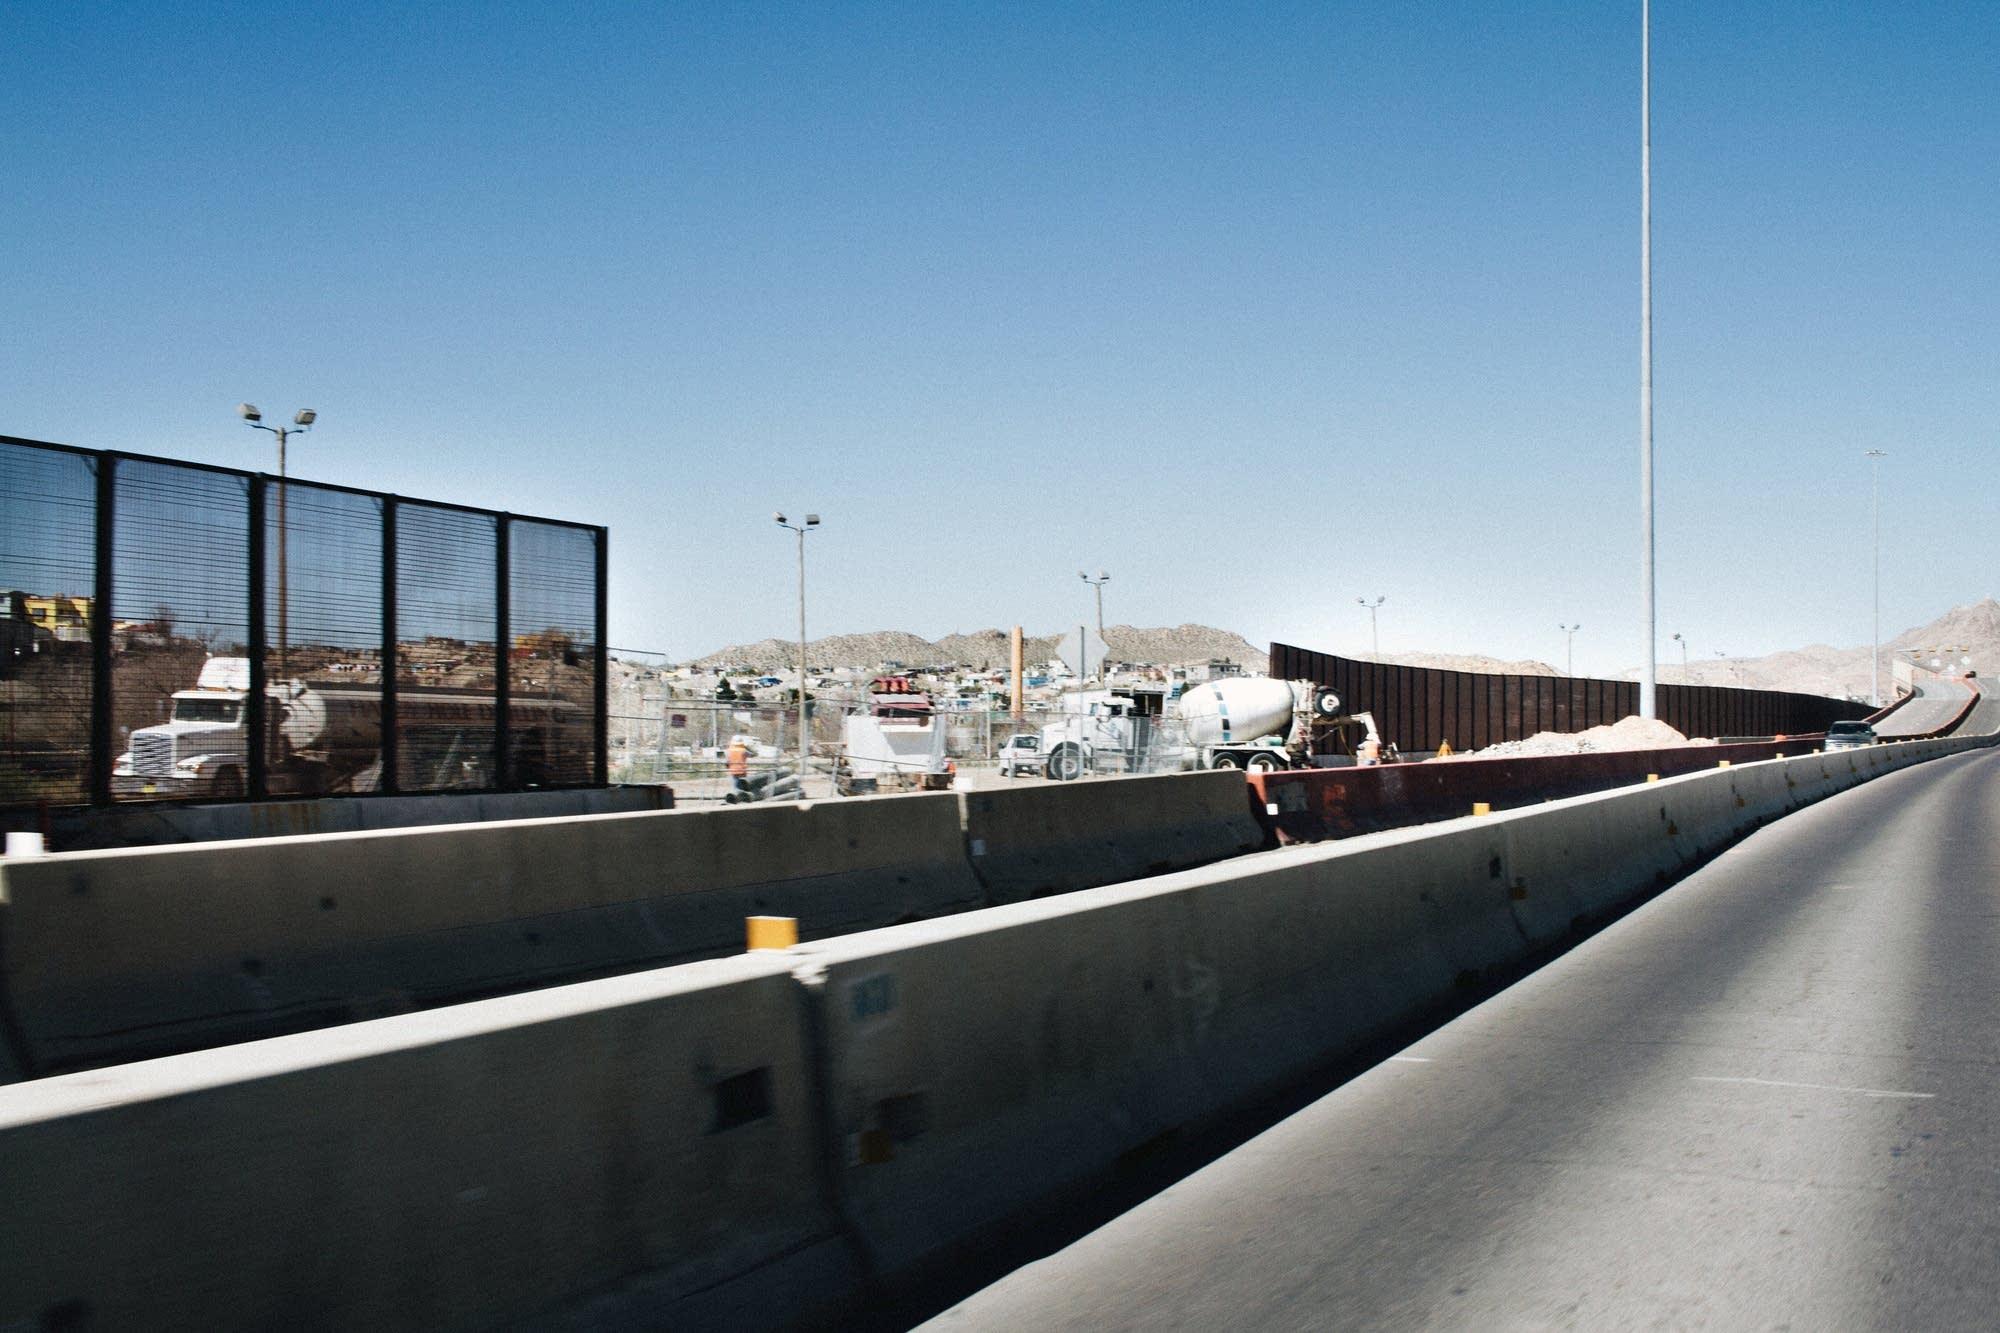 Construction of the border fence in El Paso, Texas.